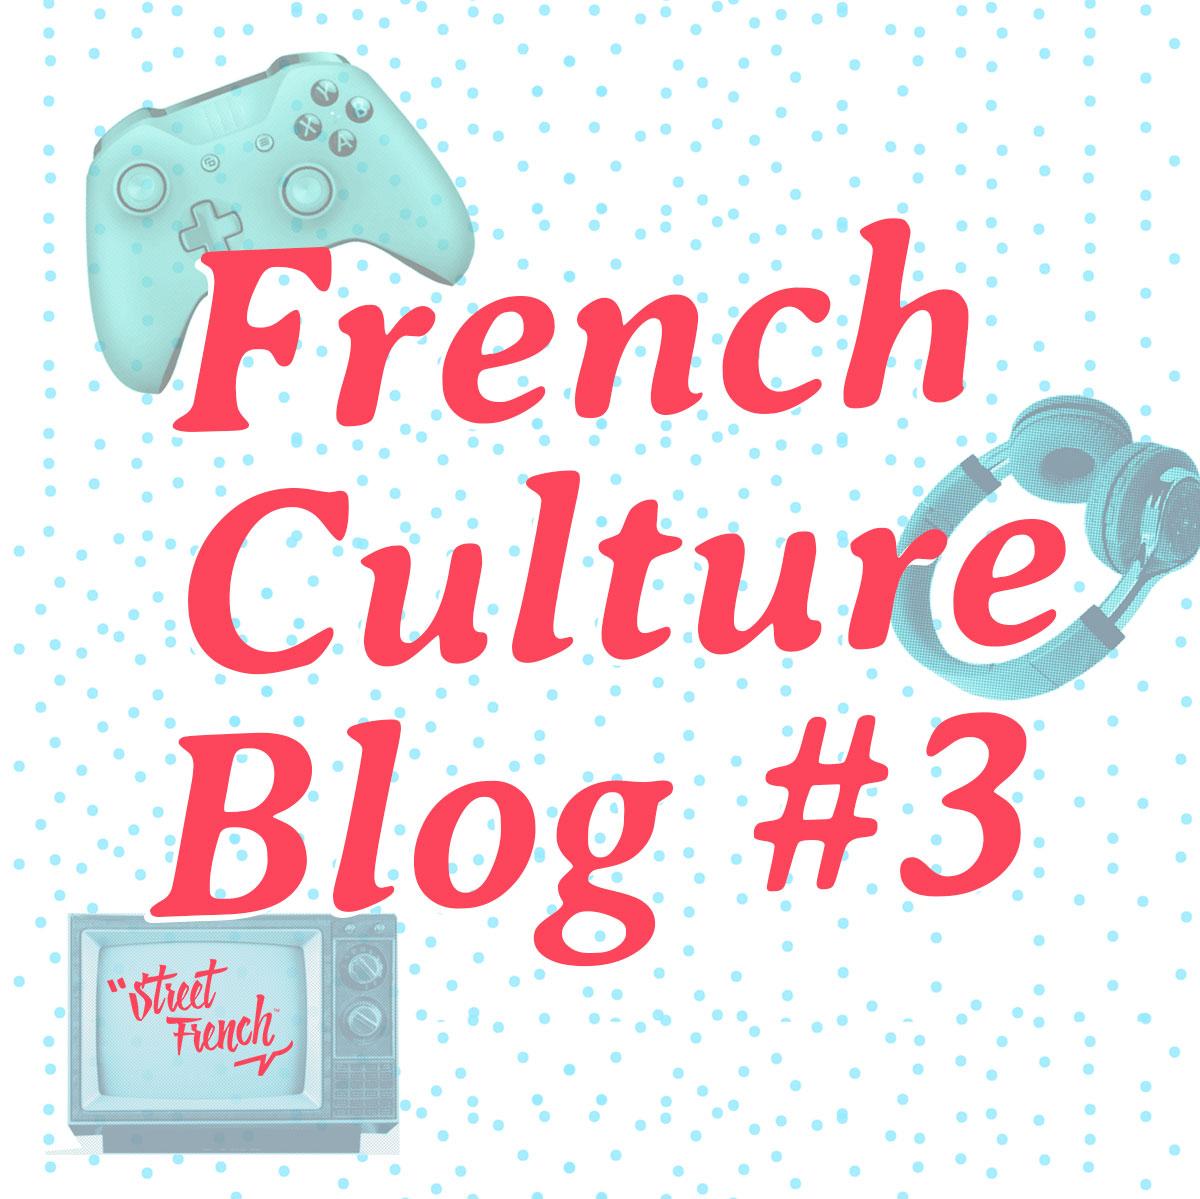 Blog-11_culture-3.jpg